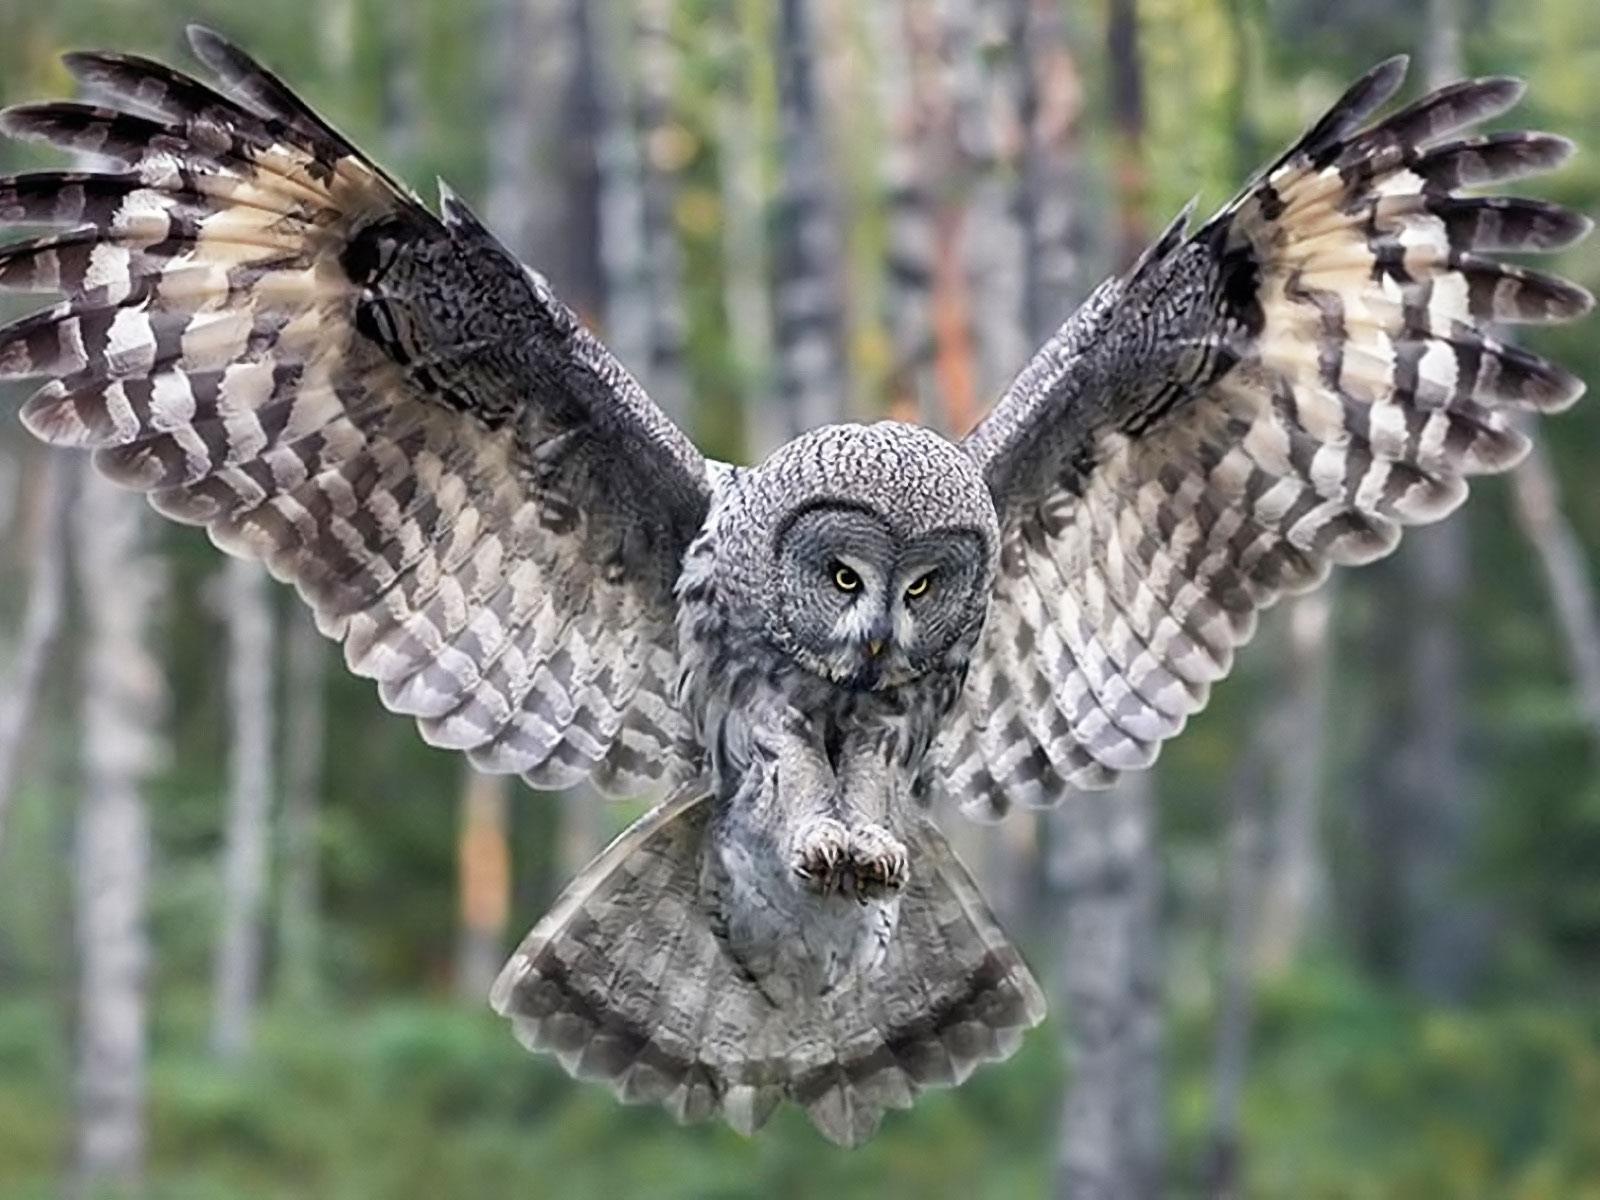 Gambar Burung Hantu Cantik Menawan  GambarBinatangCom